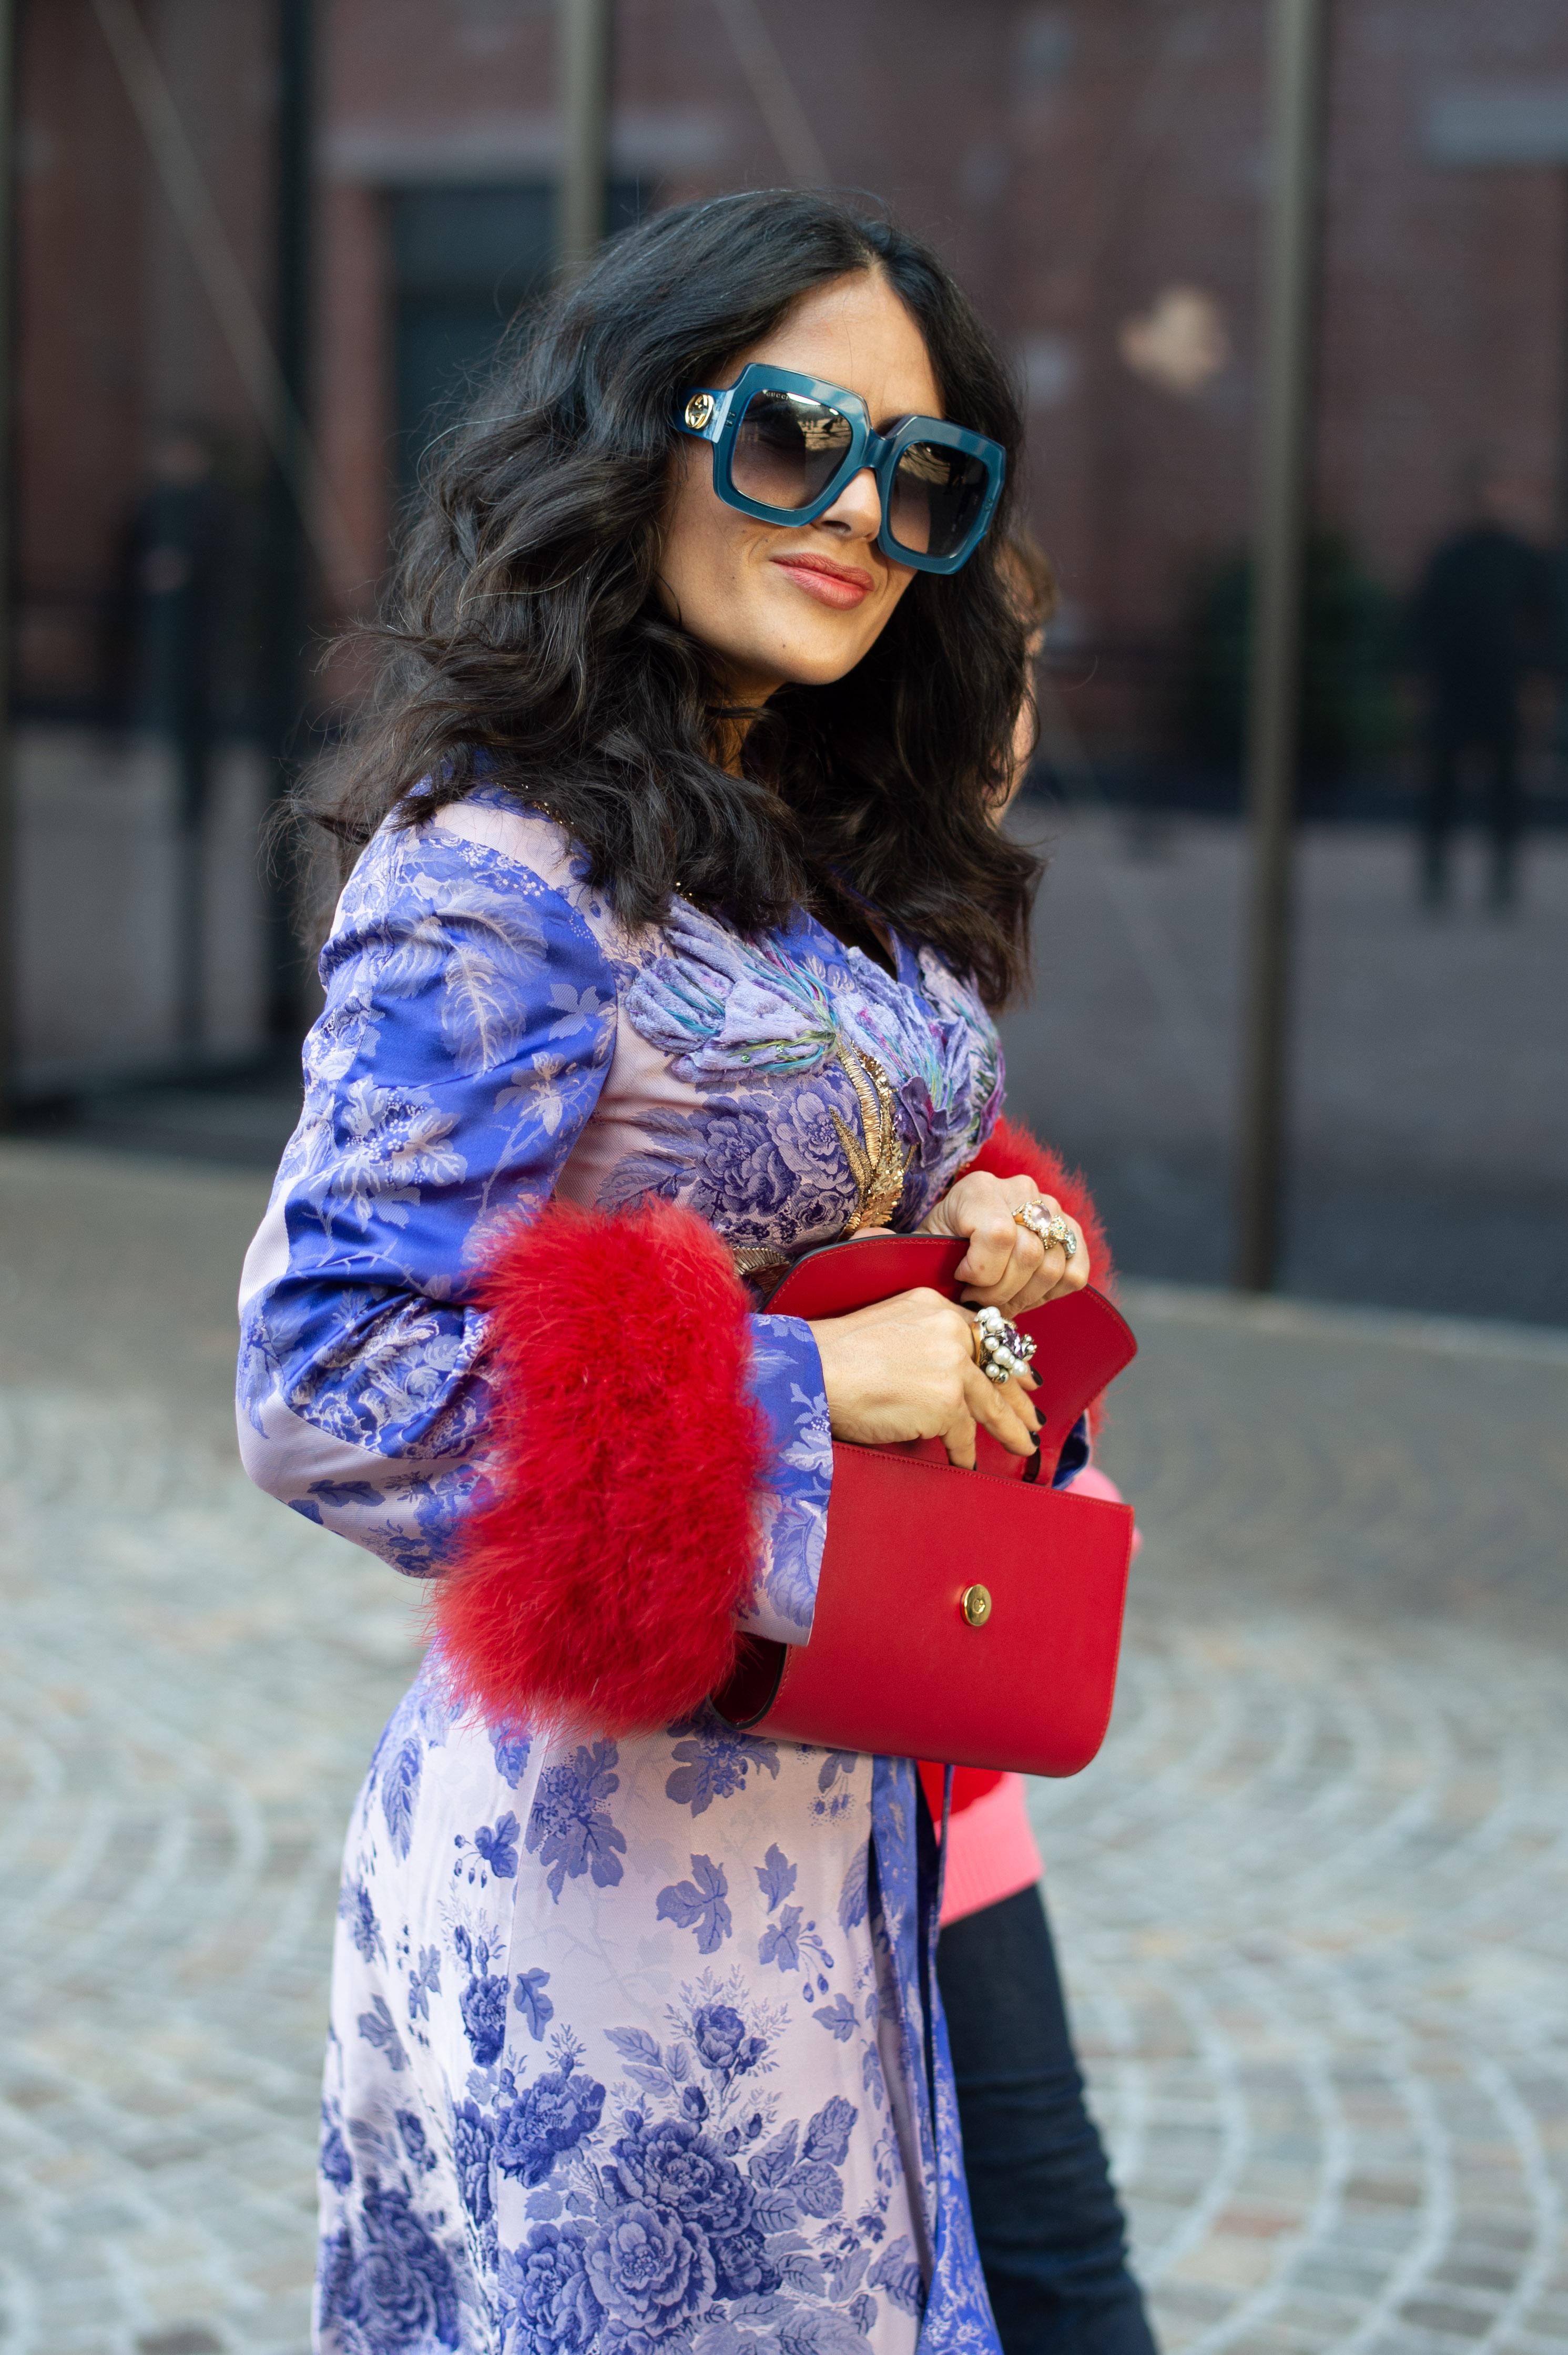 Gucci - Arrivals: Milan Fashion Week Autumn/Winter 2019/20